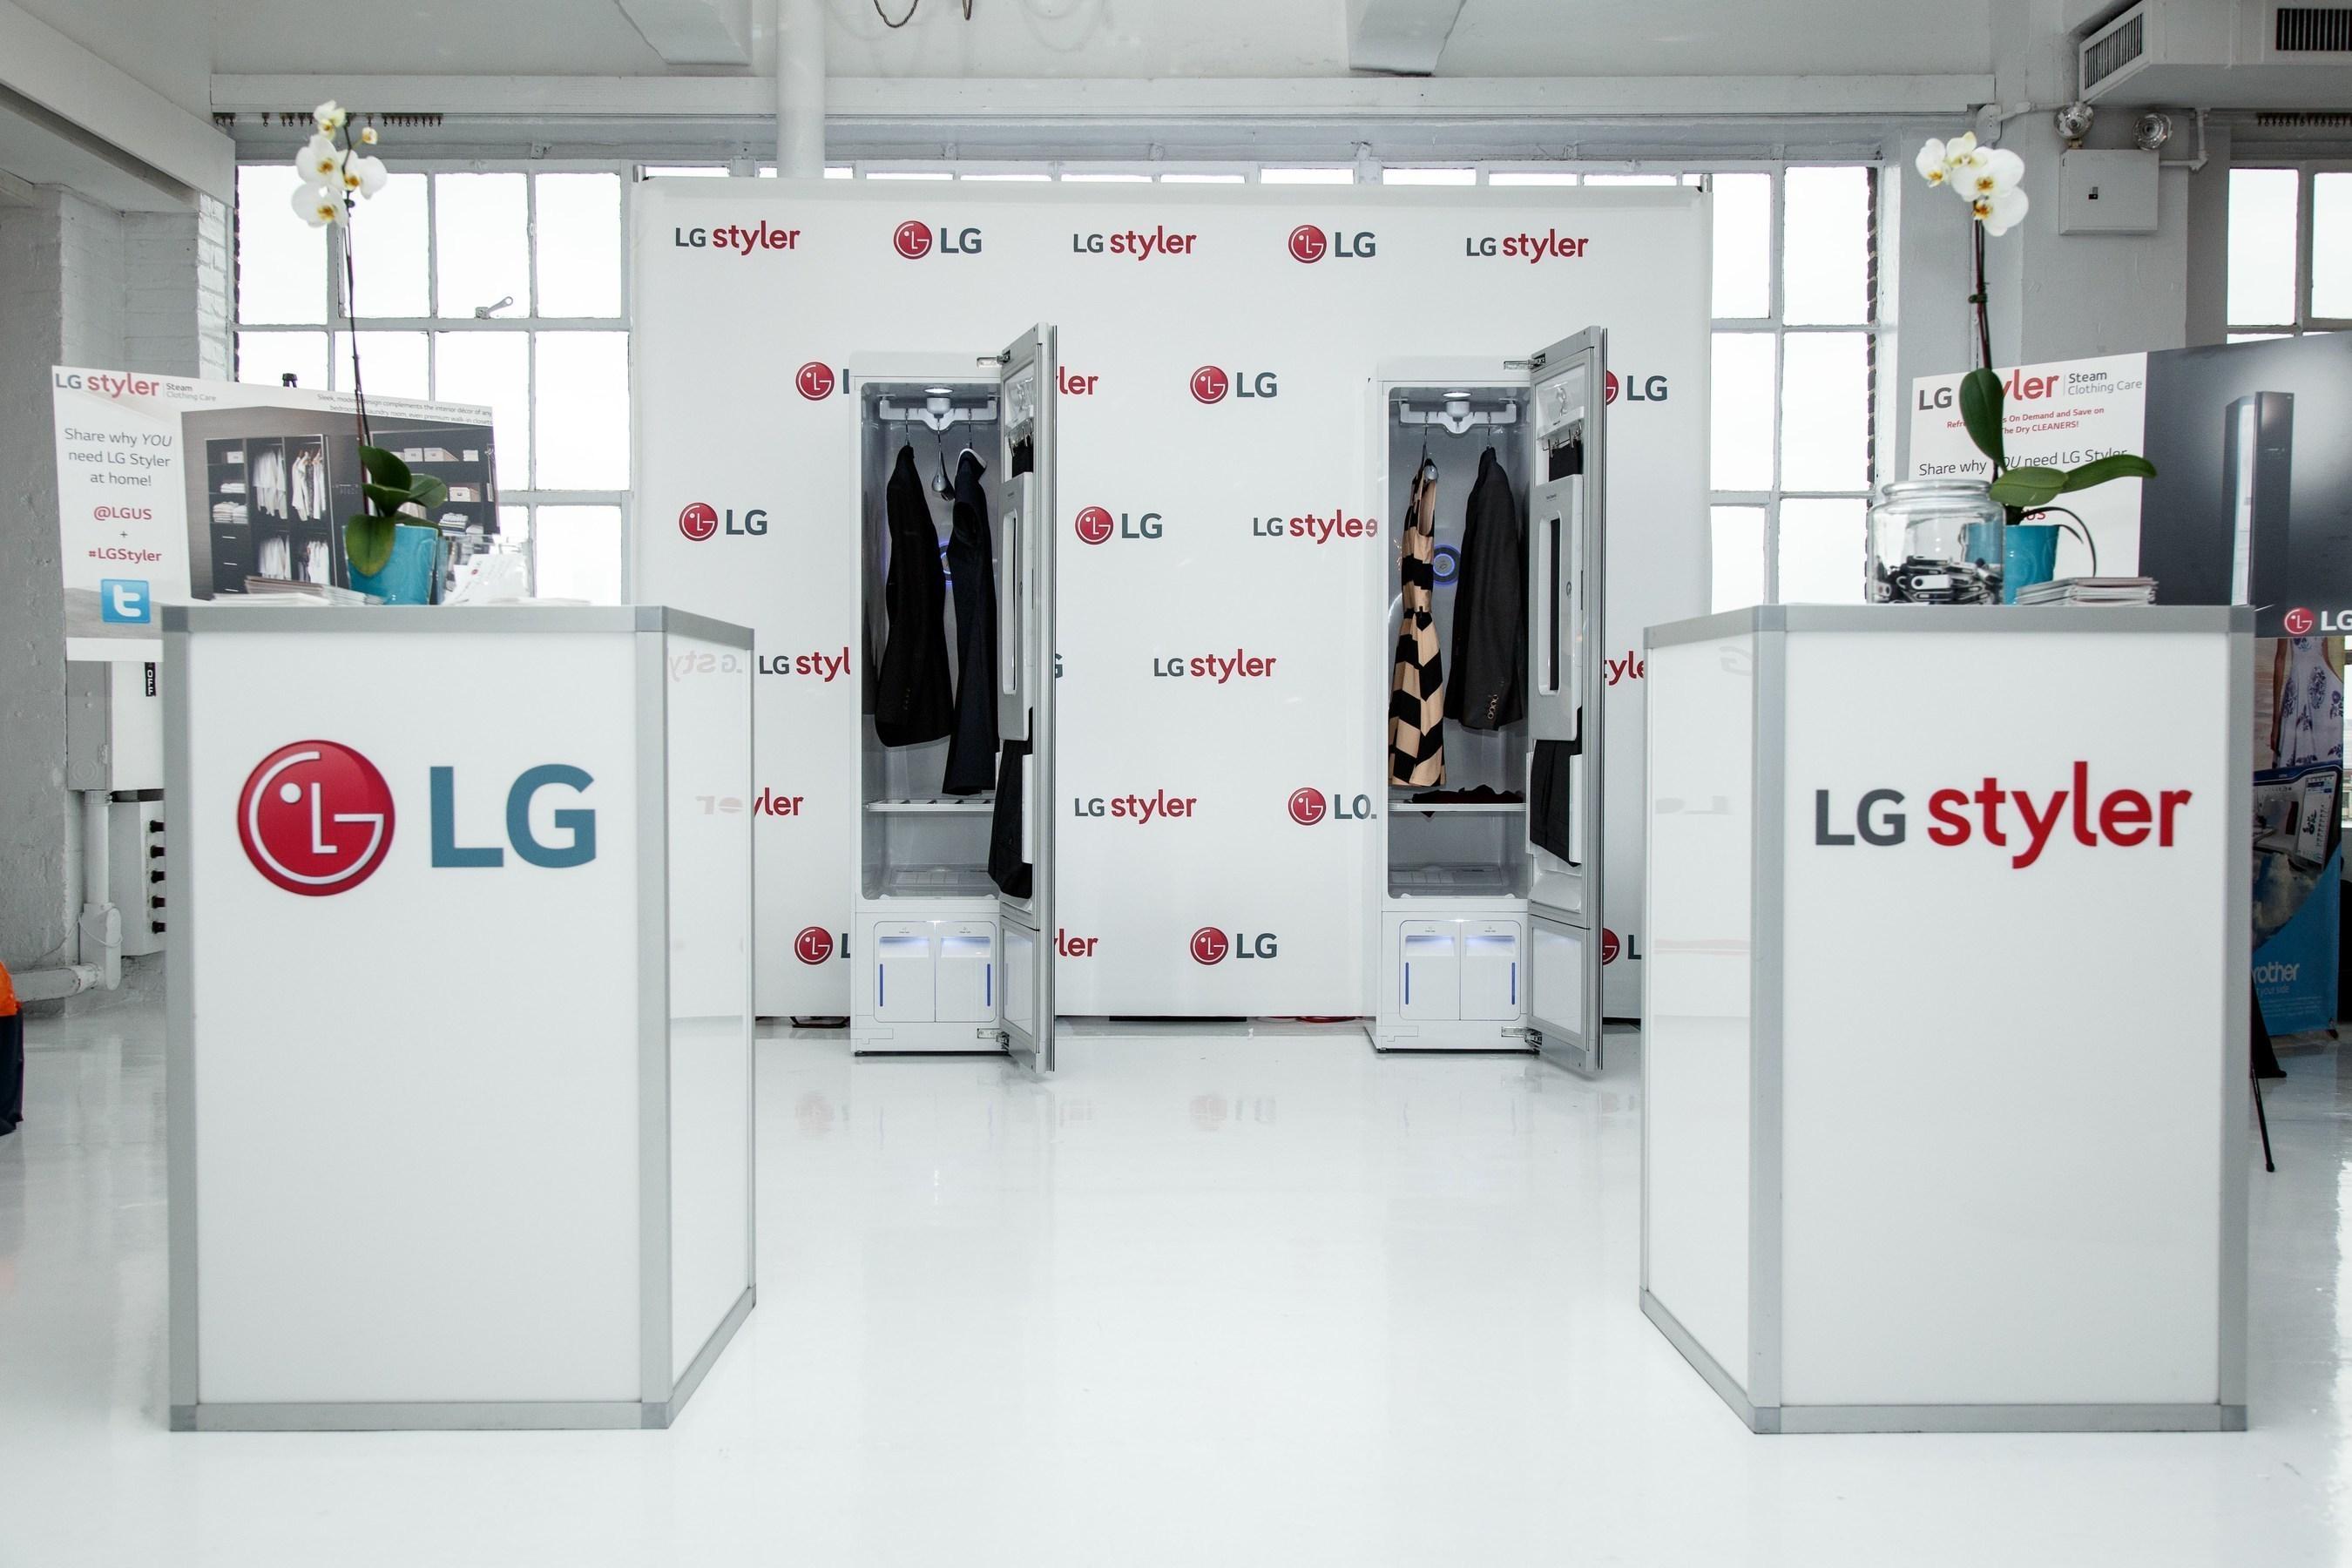 LG Styler displayed at Nextpert styleXtech VIP lounge.